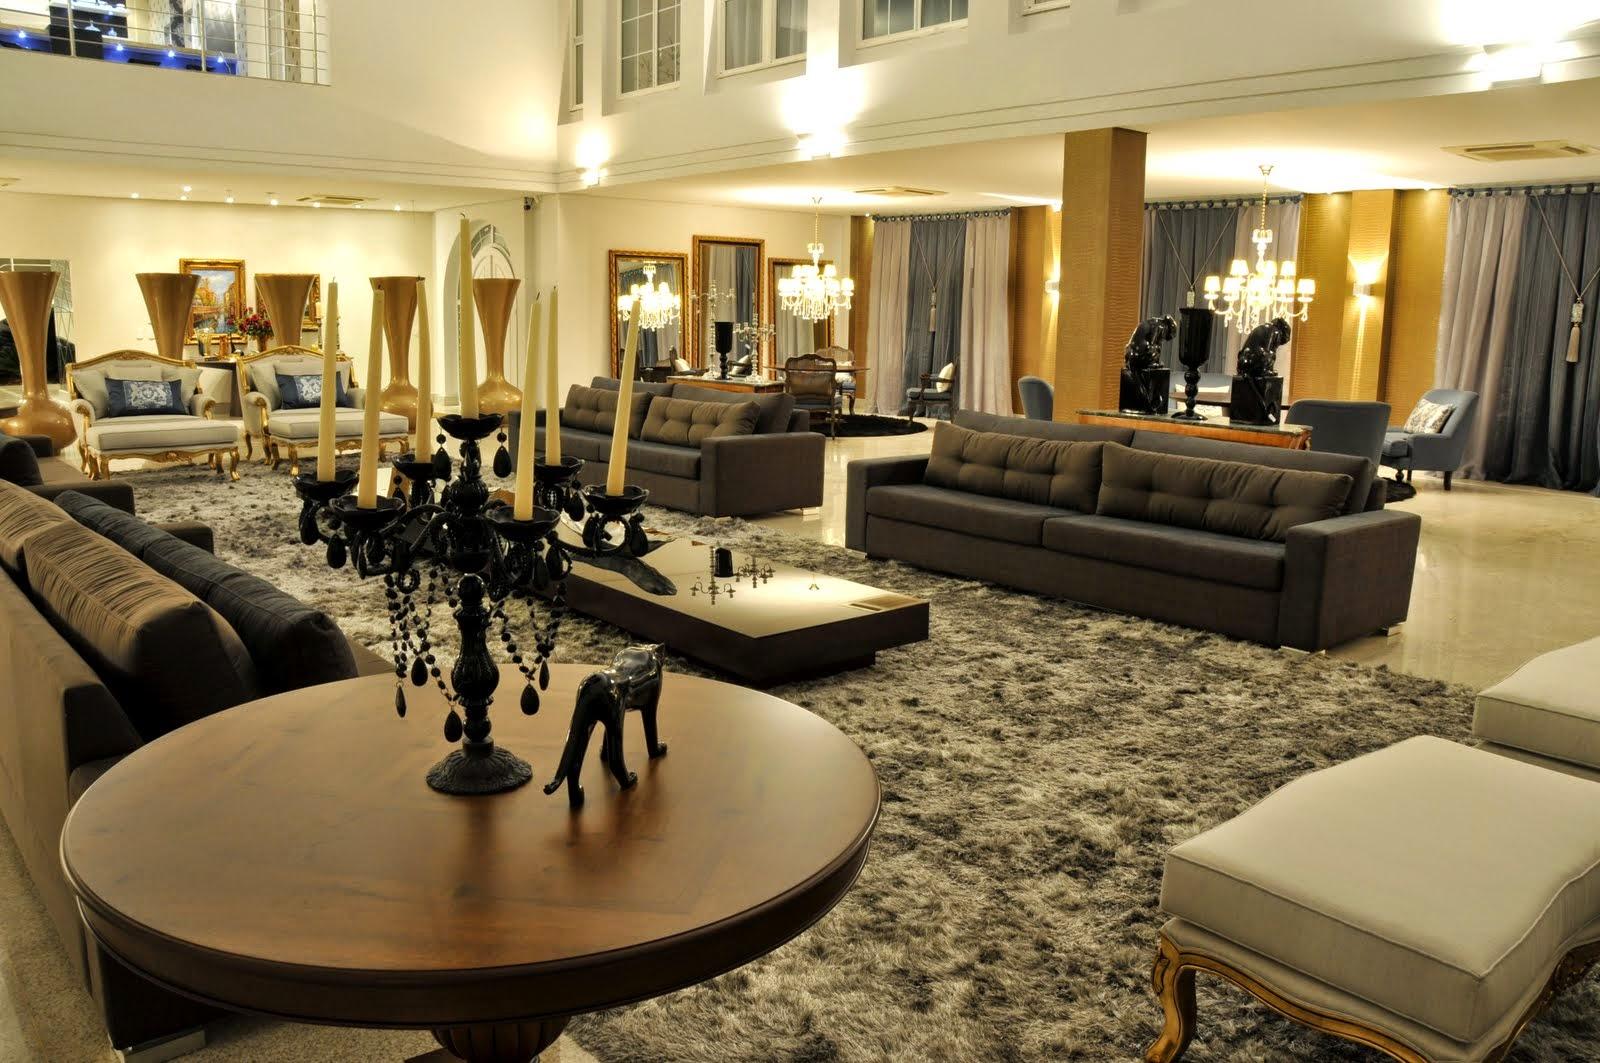 Decoracao De Sala Luxo ~ Decora Interi  Decoração de Salas Super Luxo, um luxo !!